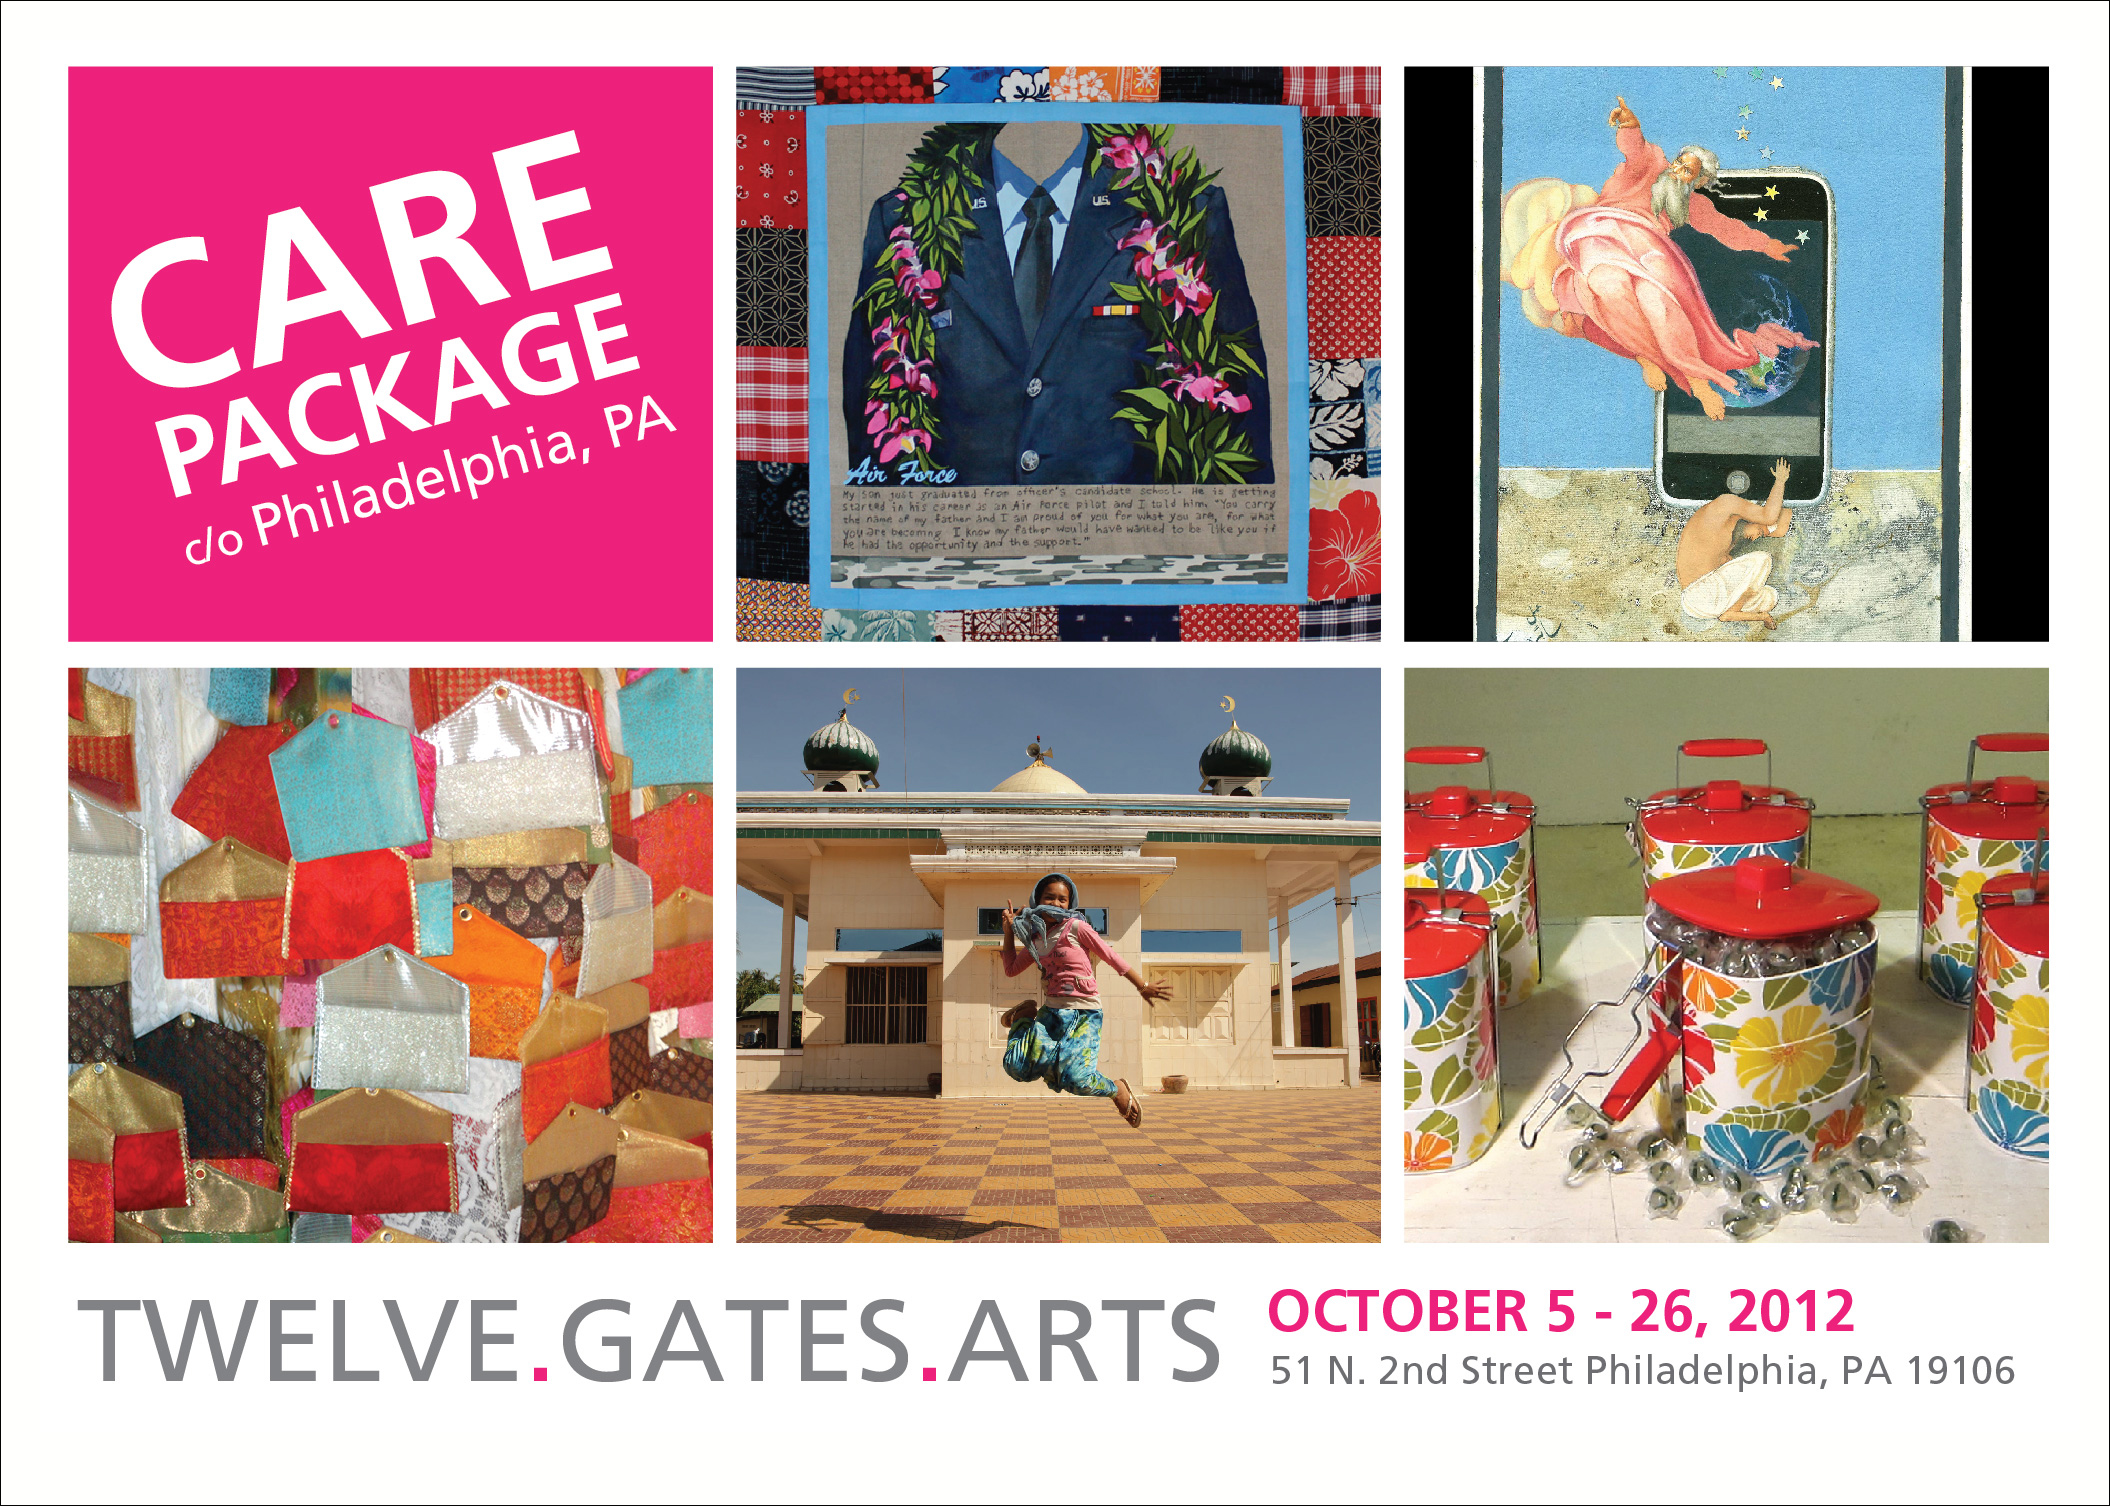 CARE PACKAGE c/o Philadelphia- Exhibition opens on October 5, 2012 at Philadelphia